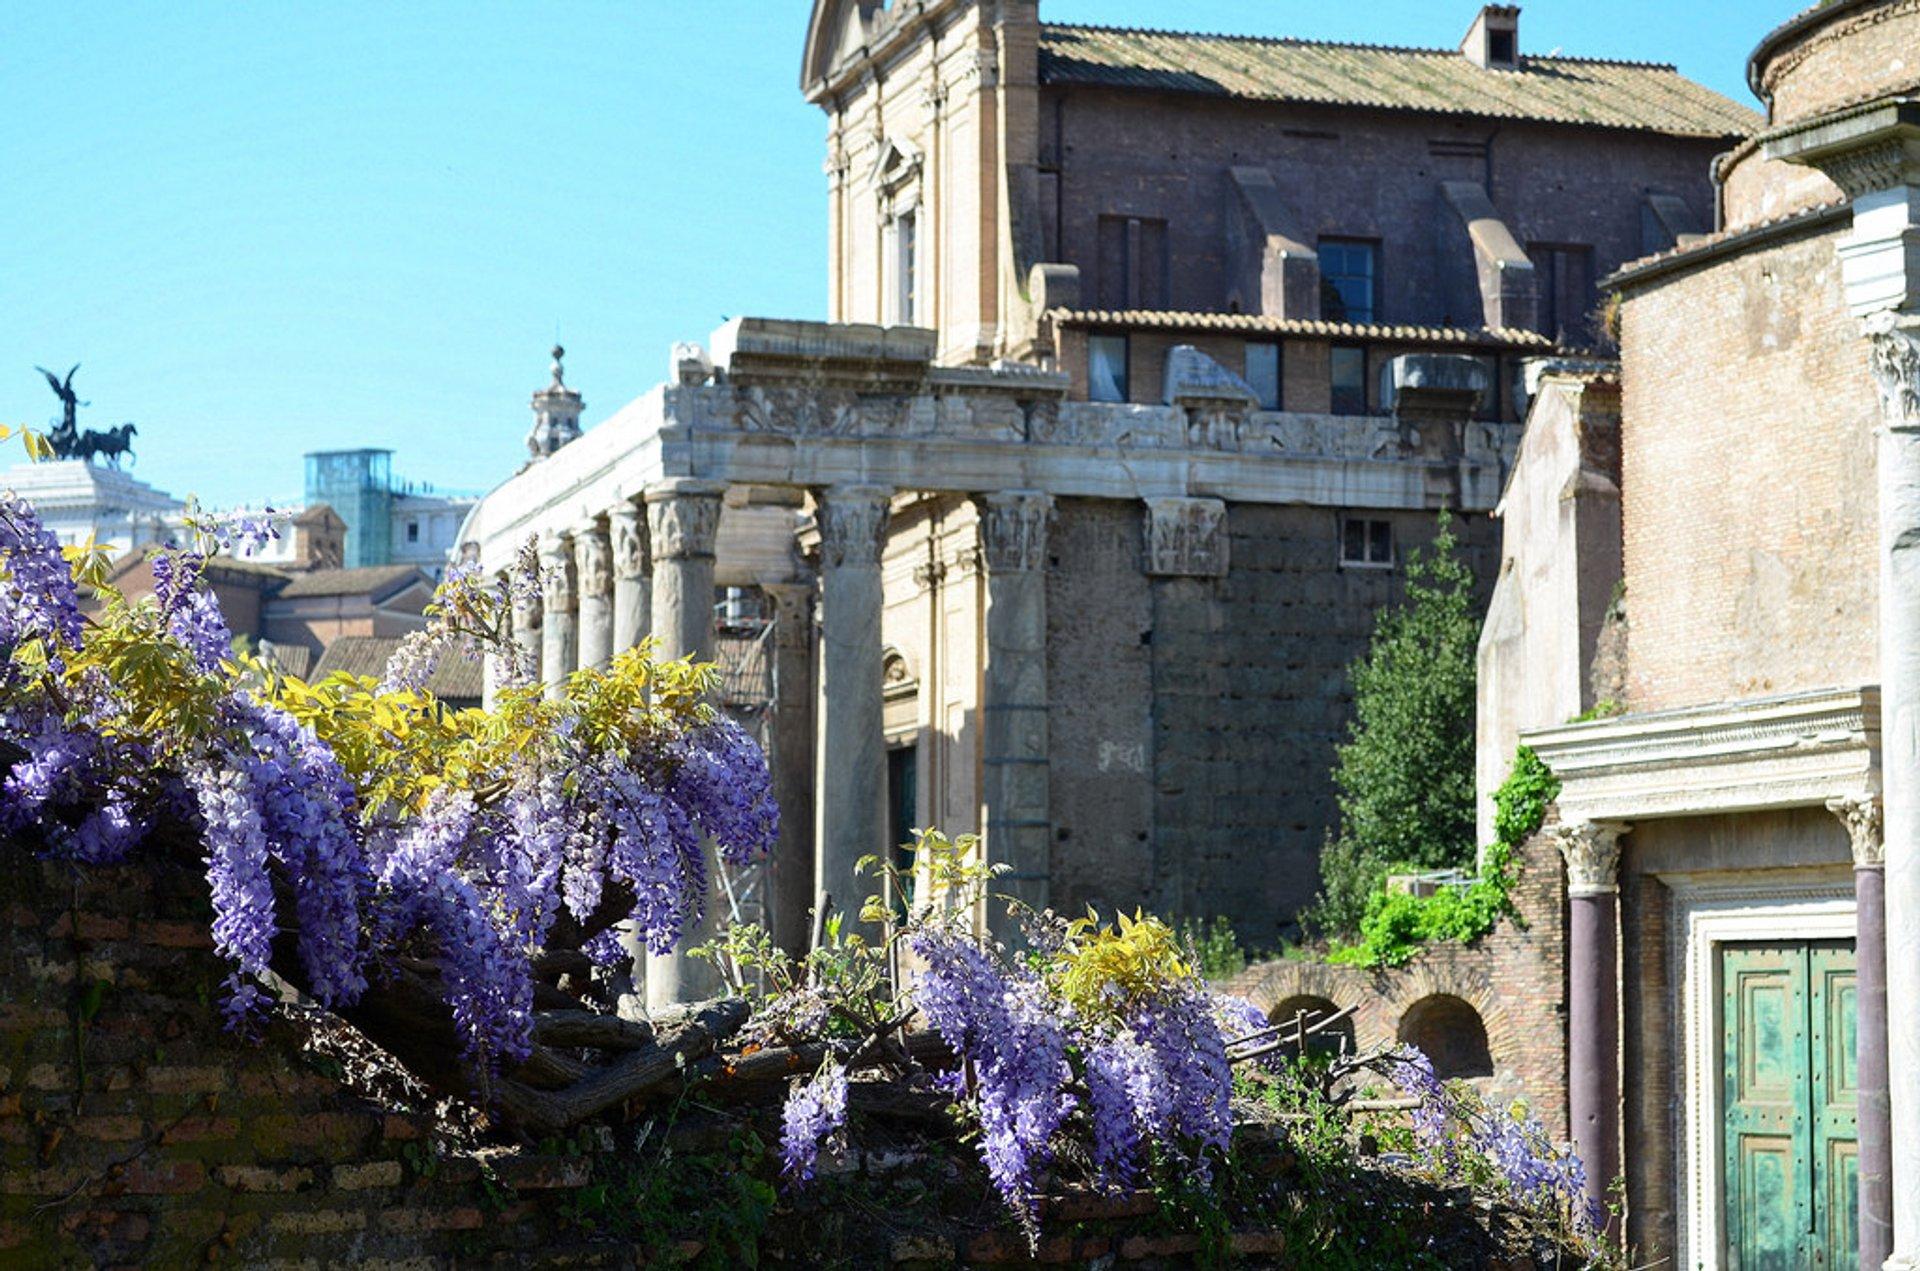 Wisteria in Bloom in Rome - Best Time